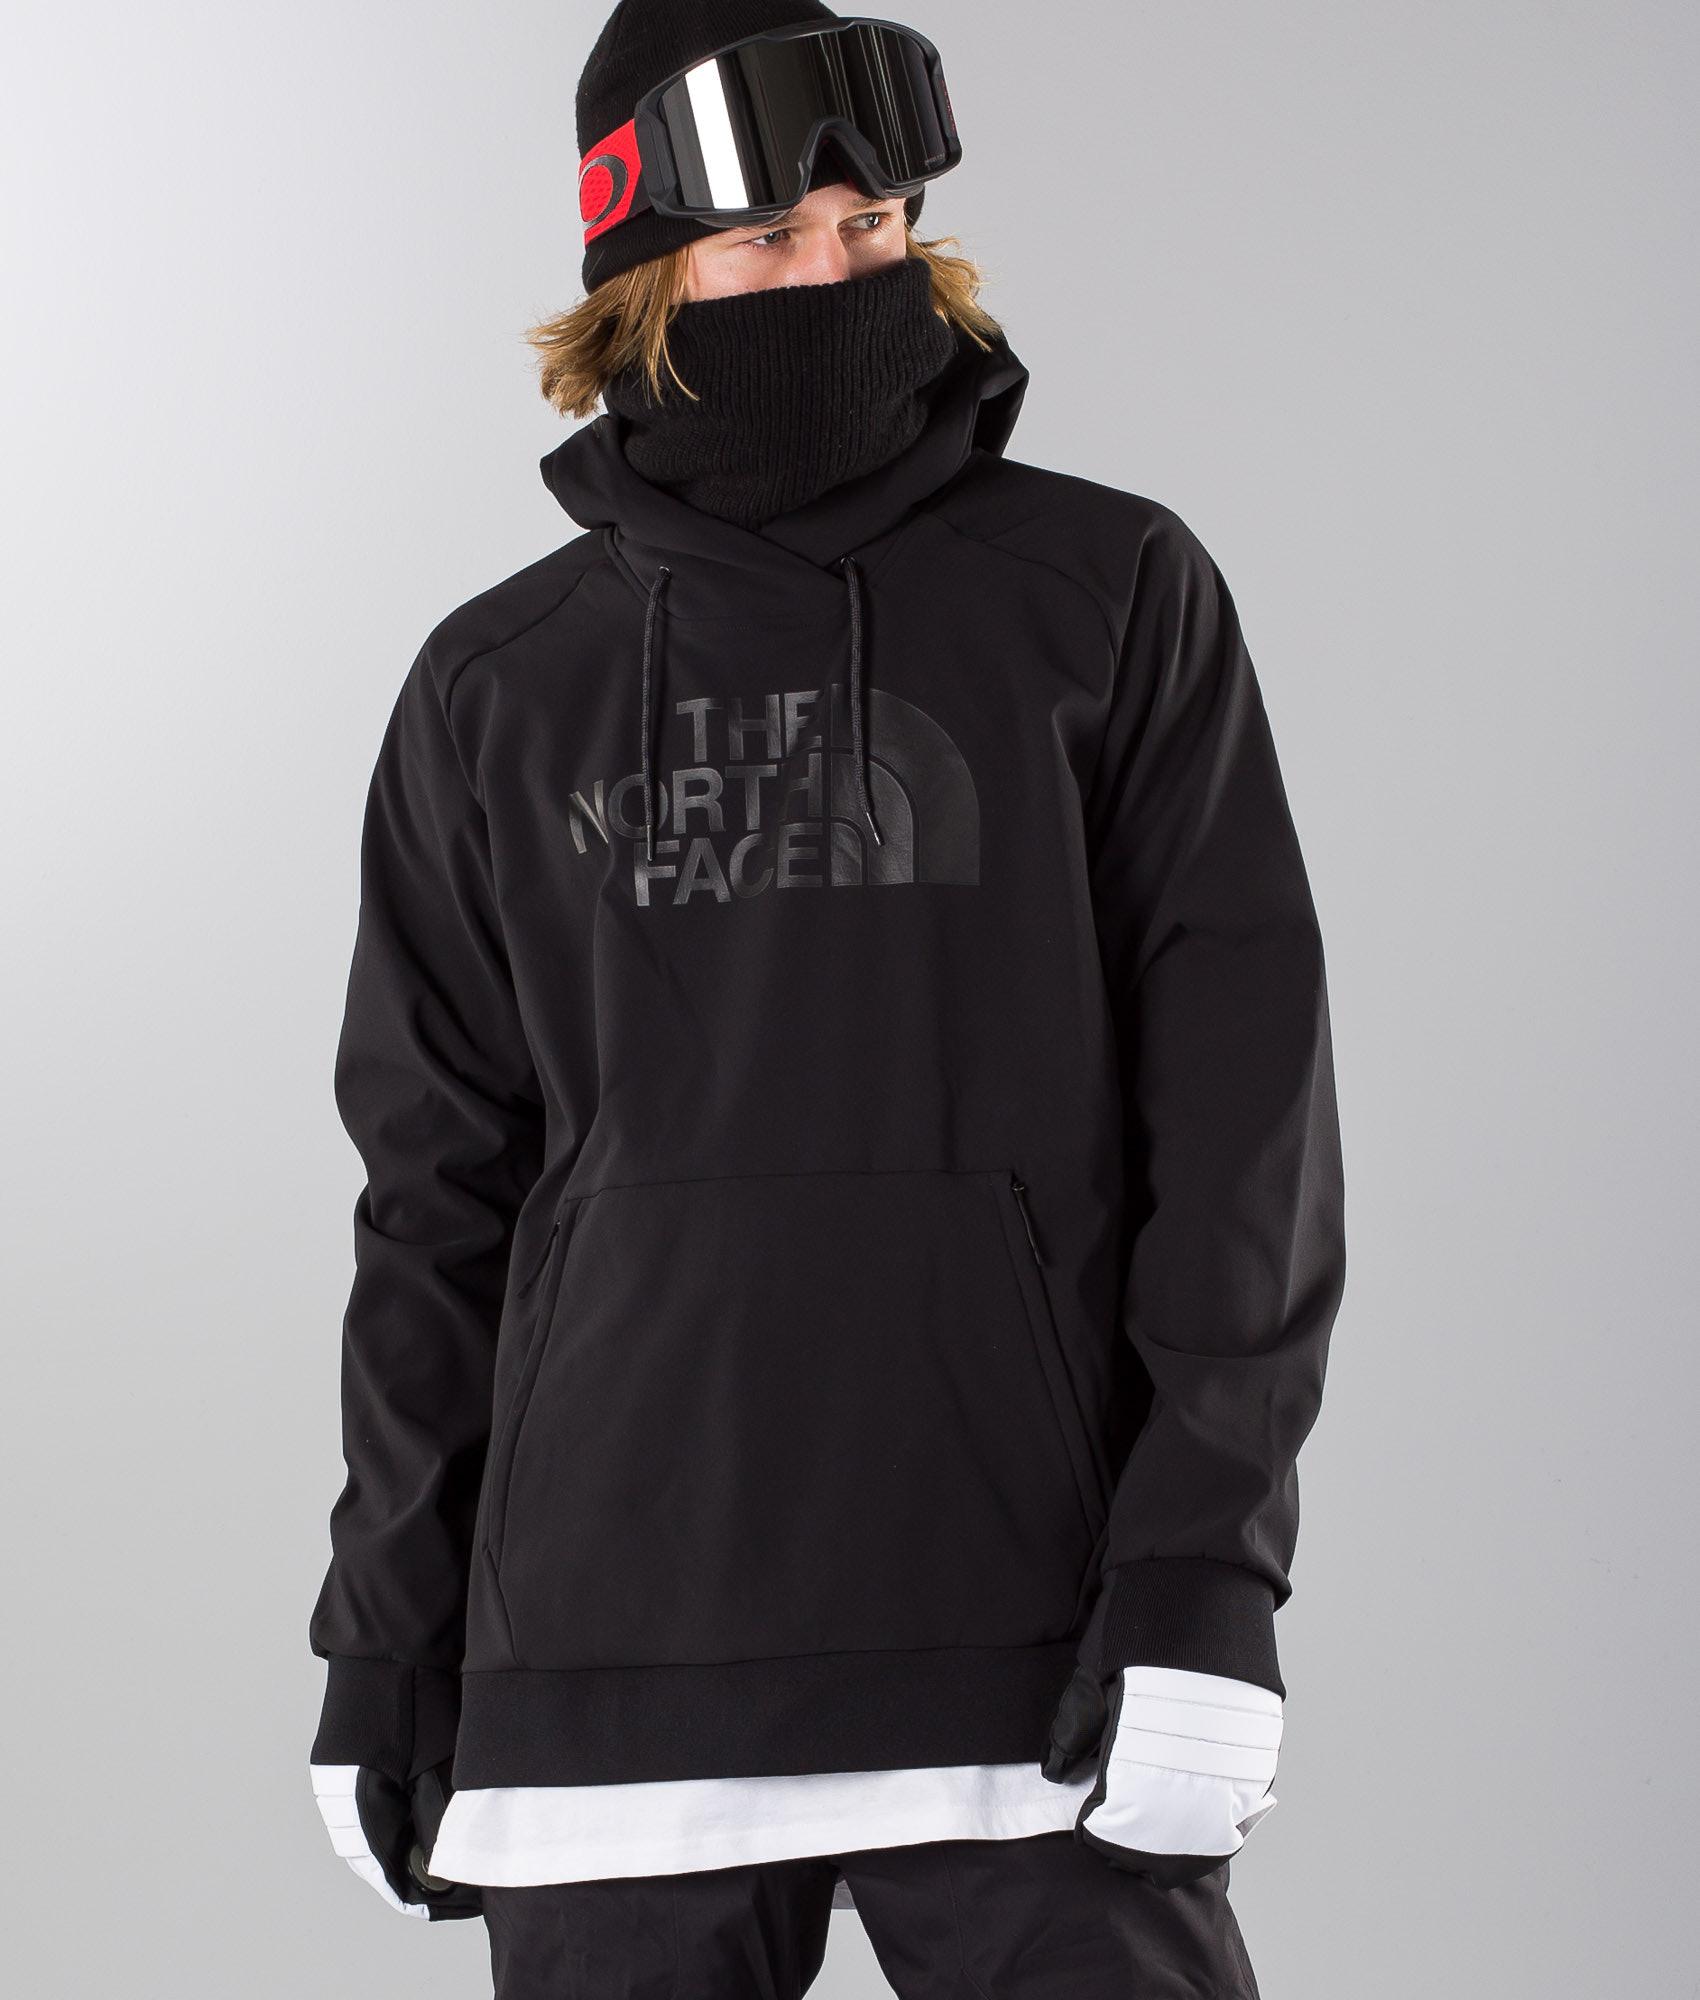 9656133ab03939 The North Face Tekno Logo Hoodie Snowboard Jacket Black - Ridestore.com